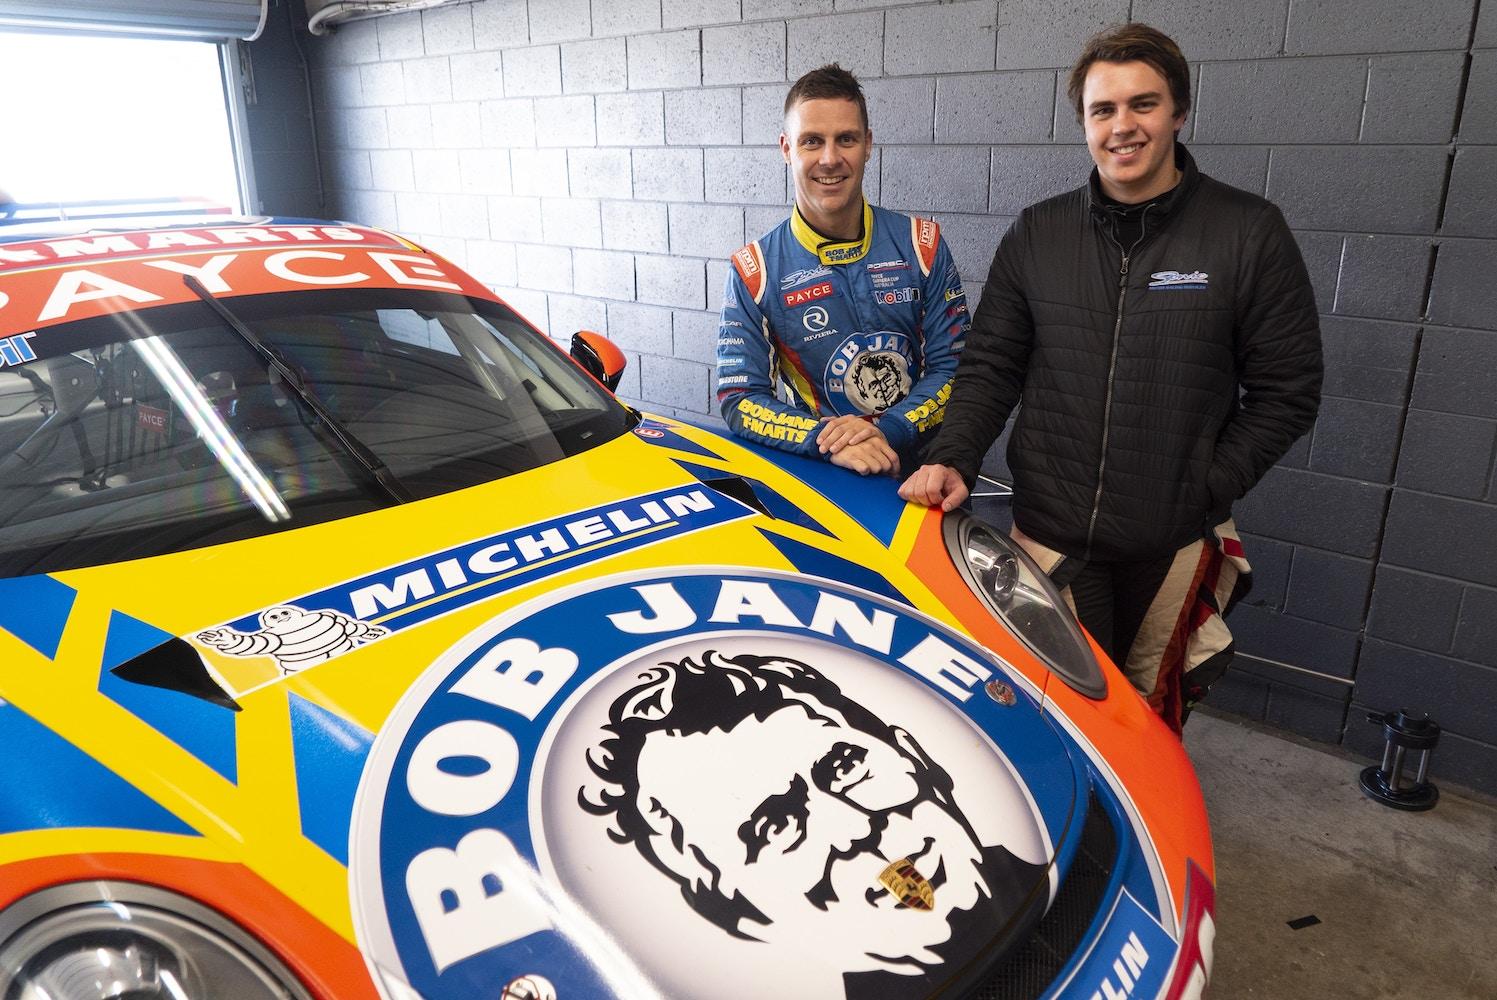 Bob Jane T-Marts Porsche Carrera Cup Drivers Announcement for 2021 Season